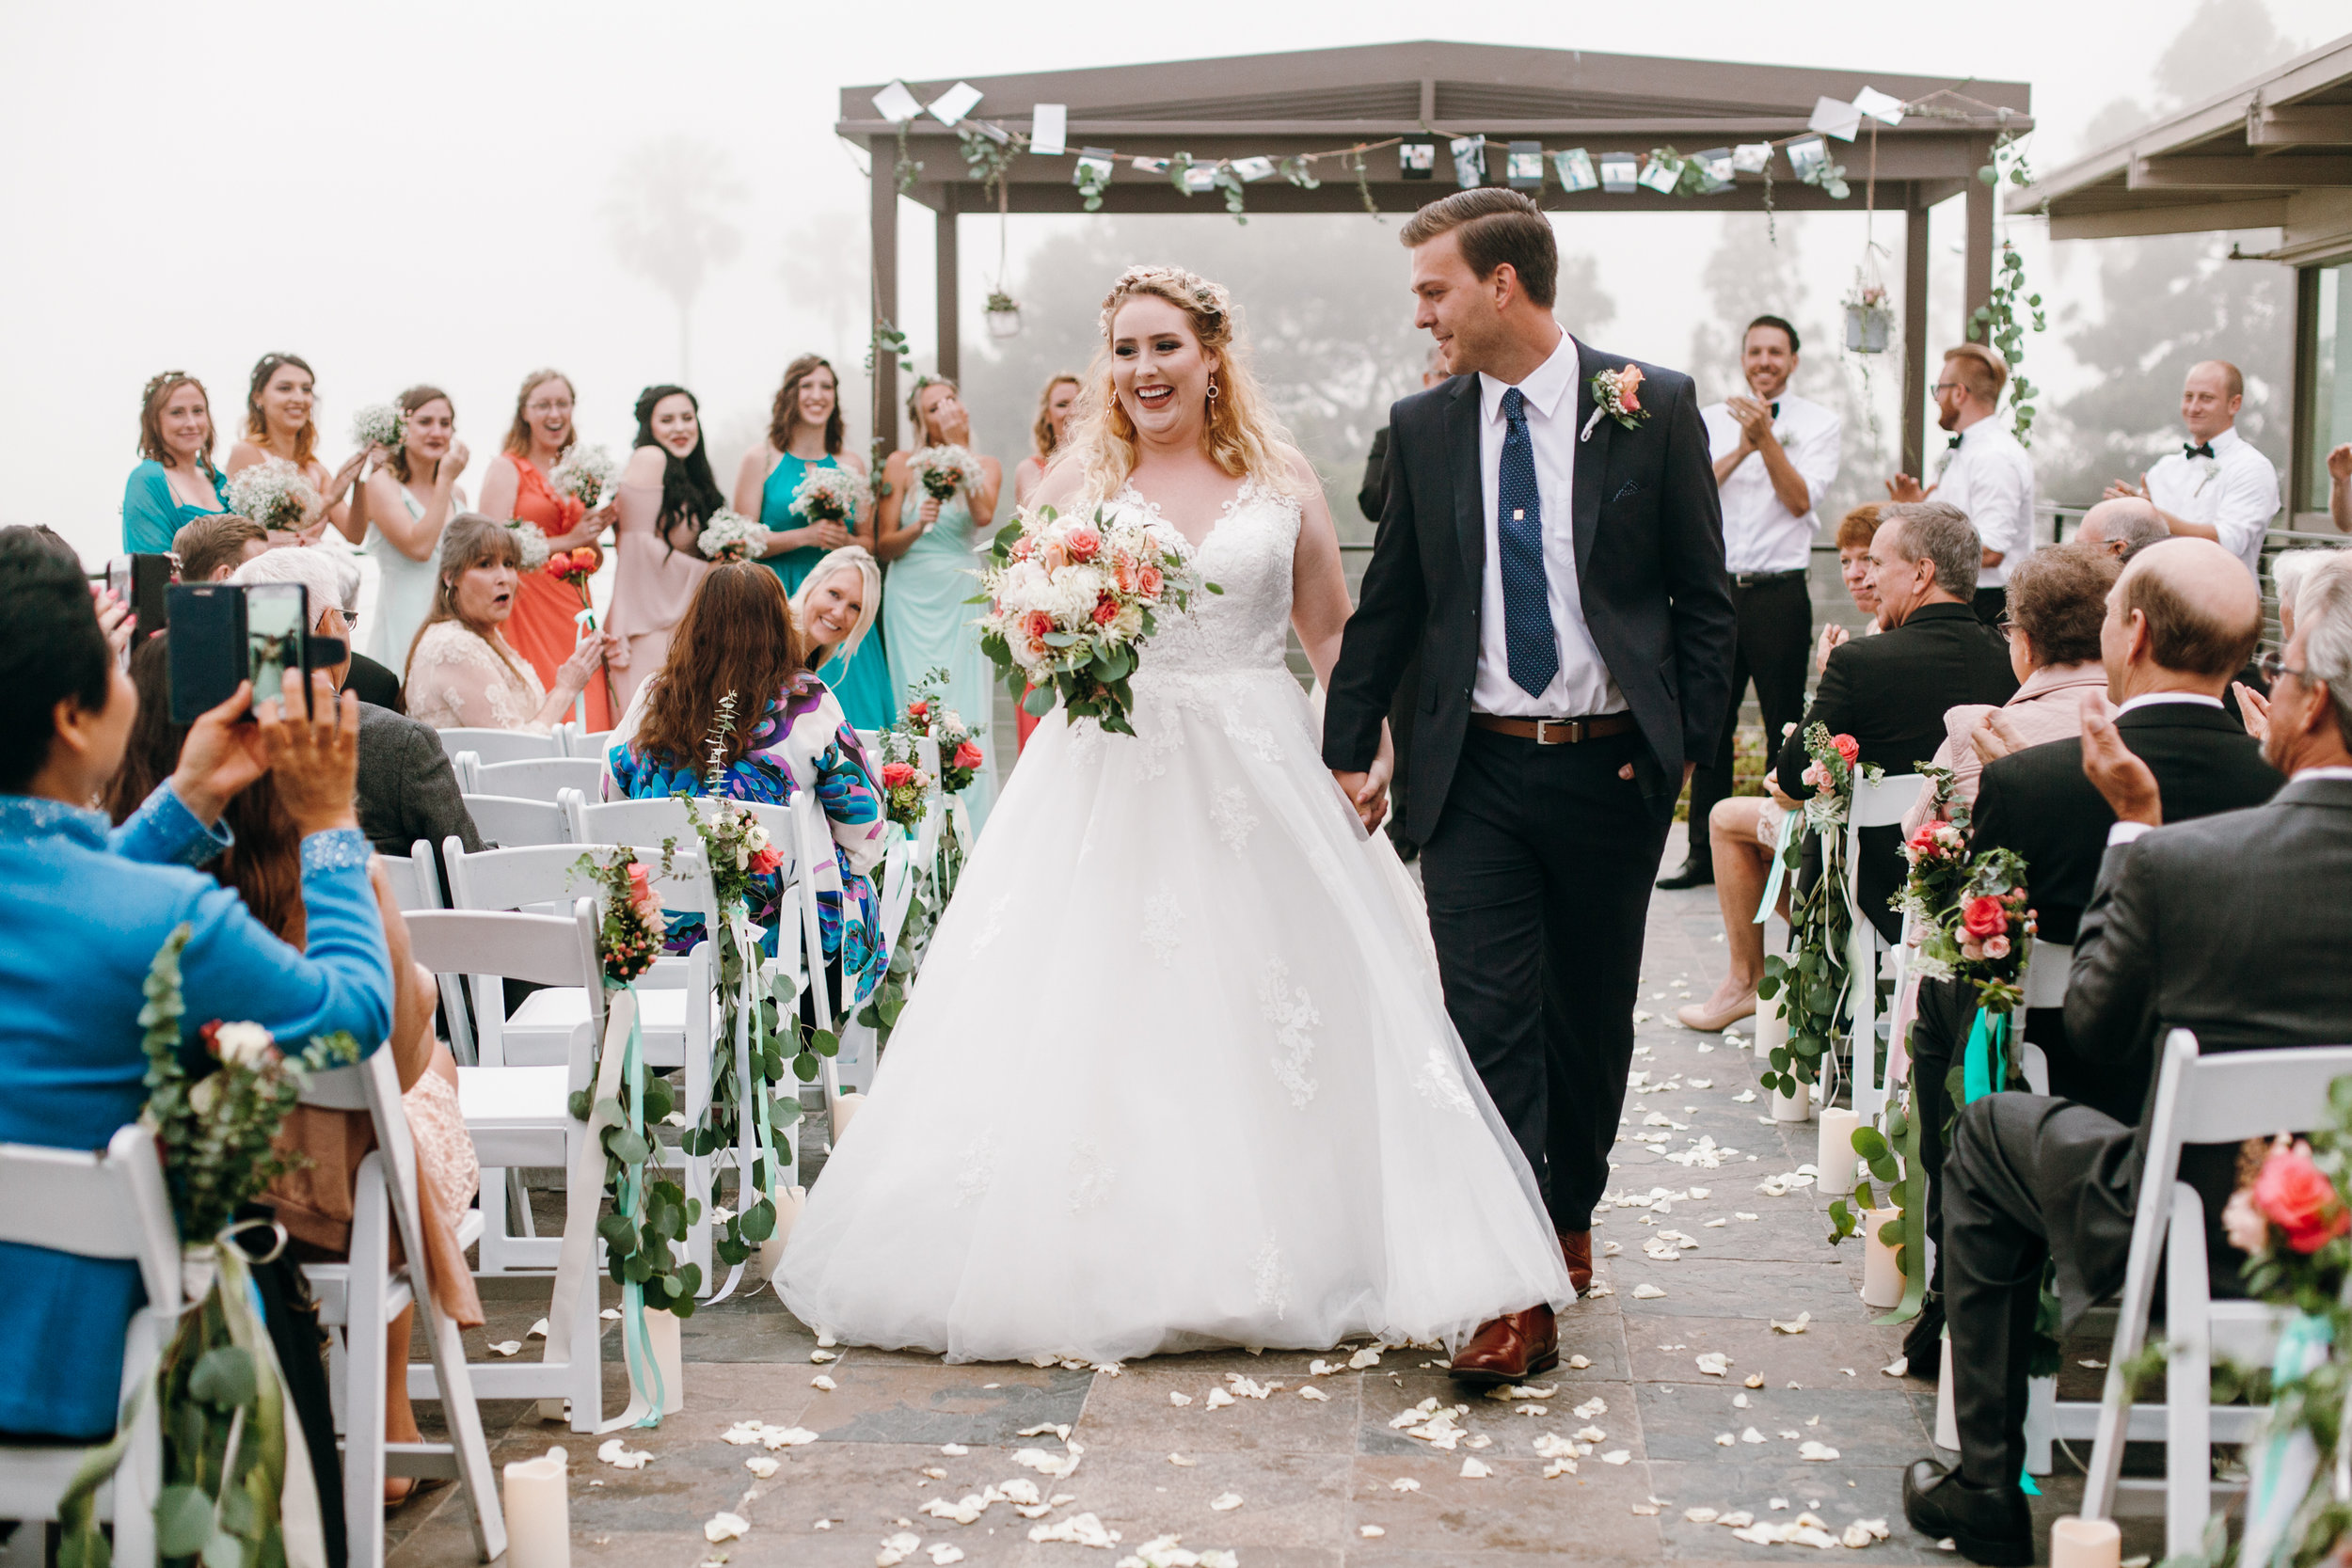 KaraNixonWeddings-PalosVerdes-Wedding-1.jpg